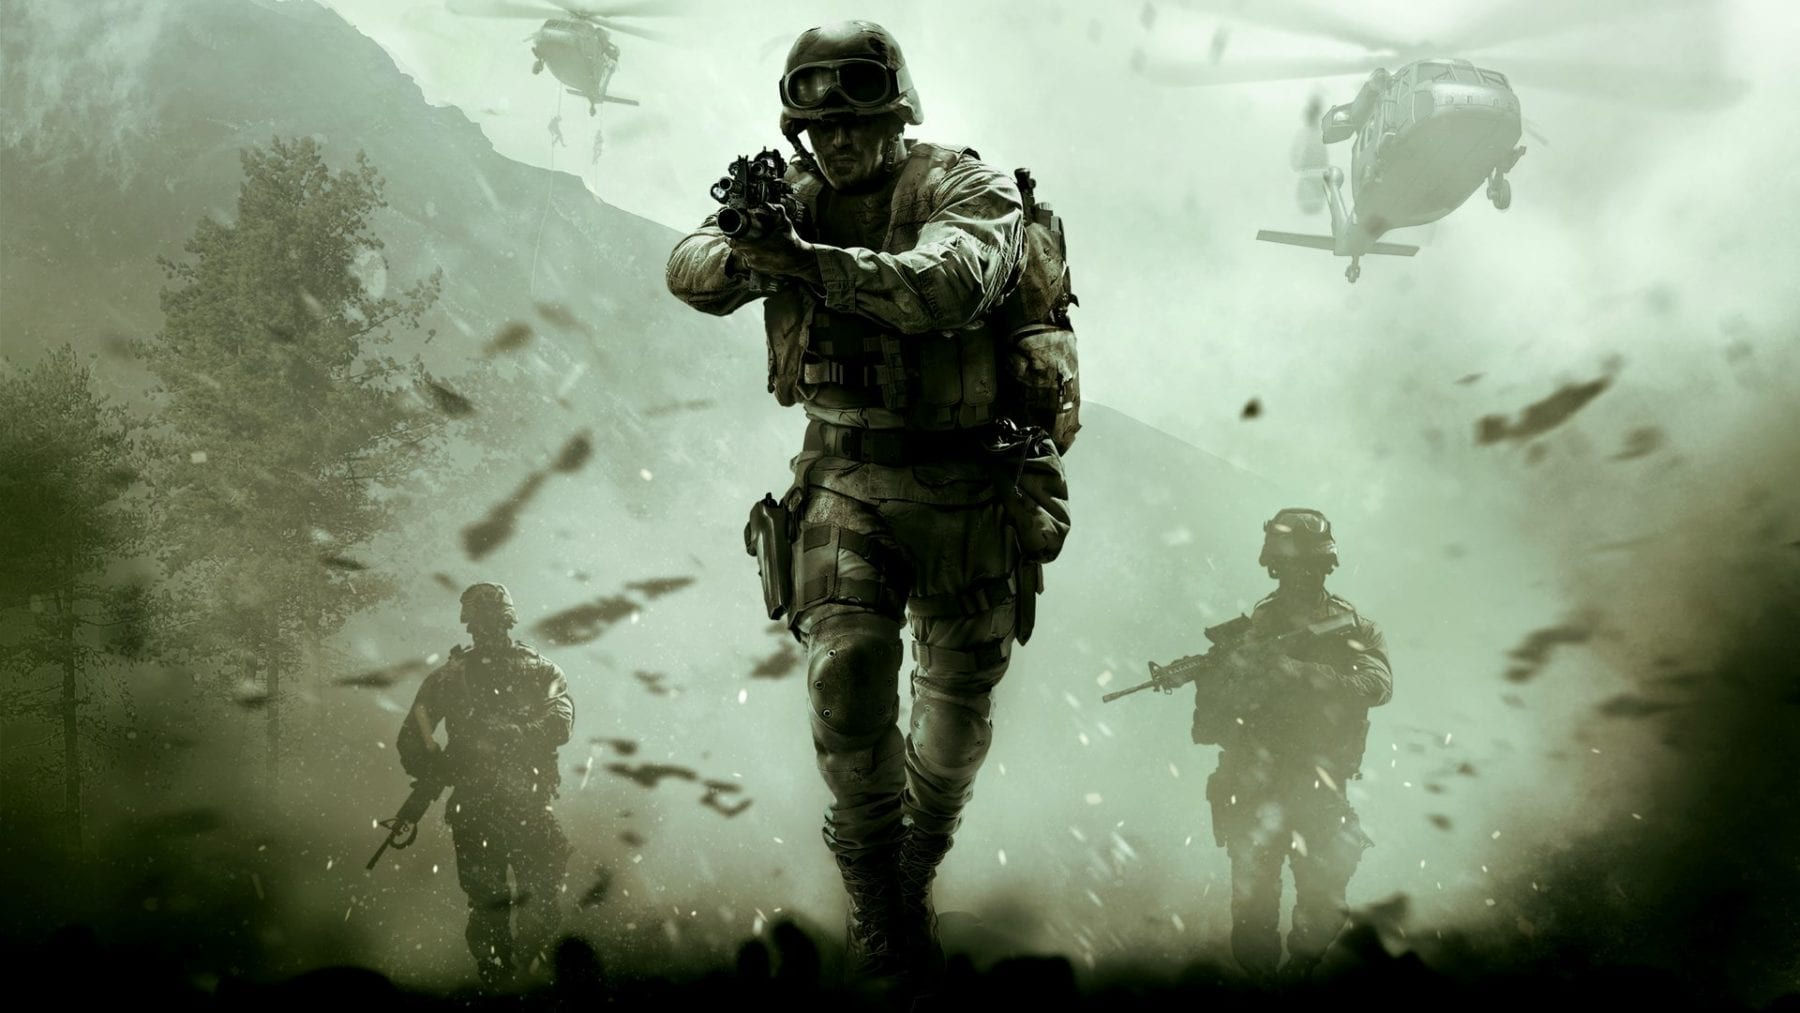 Modern Warfare Remastered: How to Fix Error Code 32770